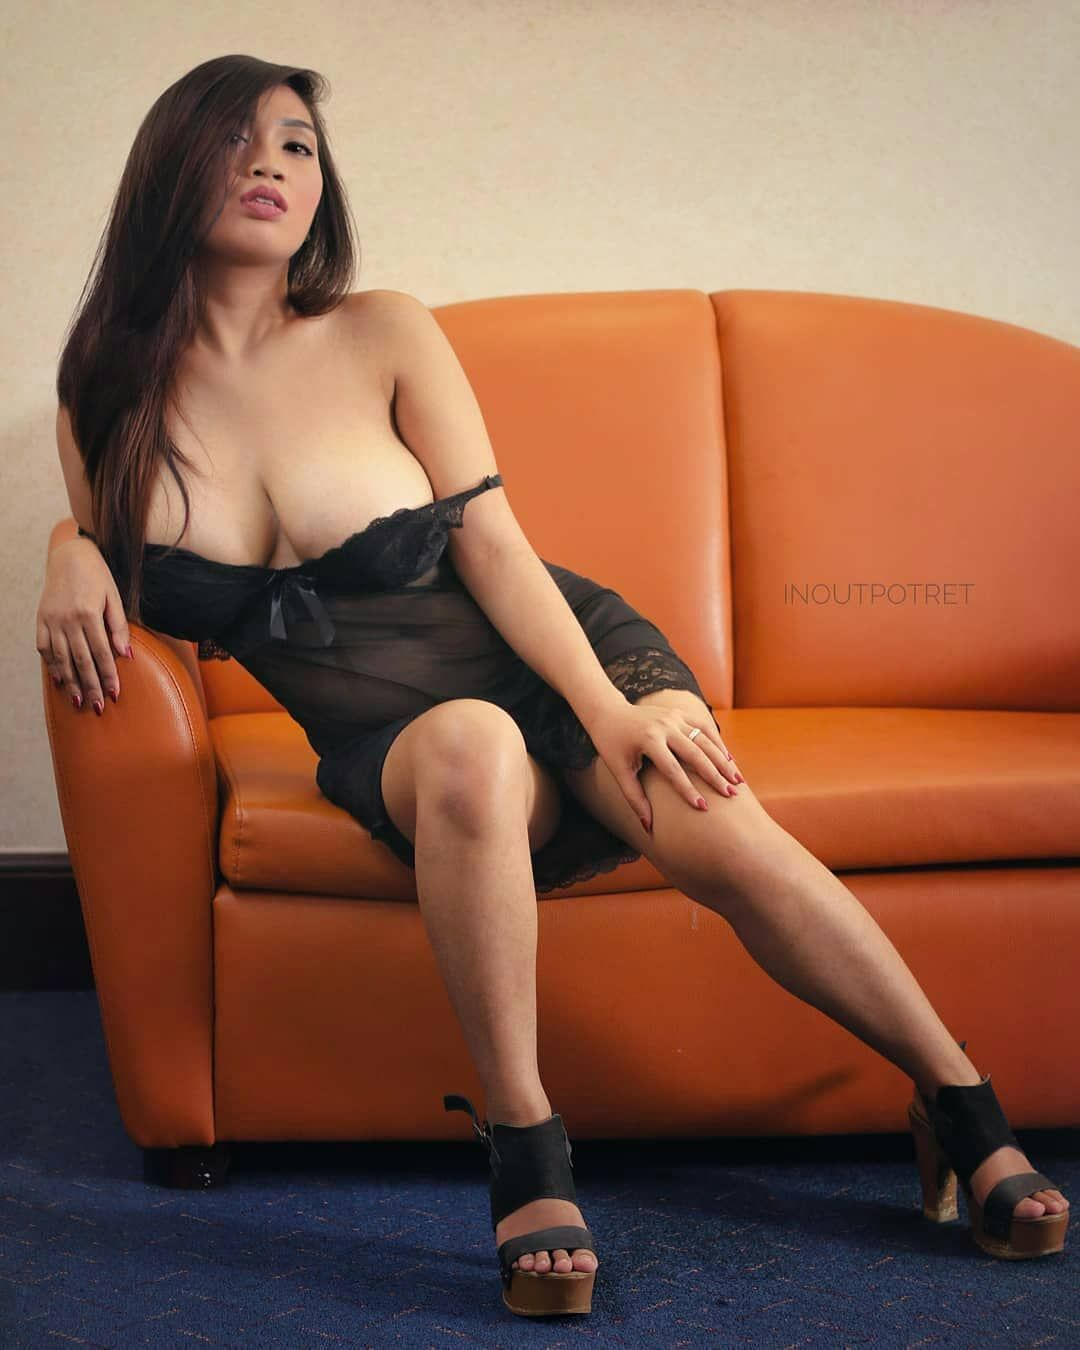 6b38abf259c6e model hits  modelhits008 Instagram Friday mood ❤❤❤ Inframe 👉 Maharani  taken by 📷  inoutpotret  modelhits  indomodel  modelindo  nude  ...   yooying